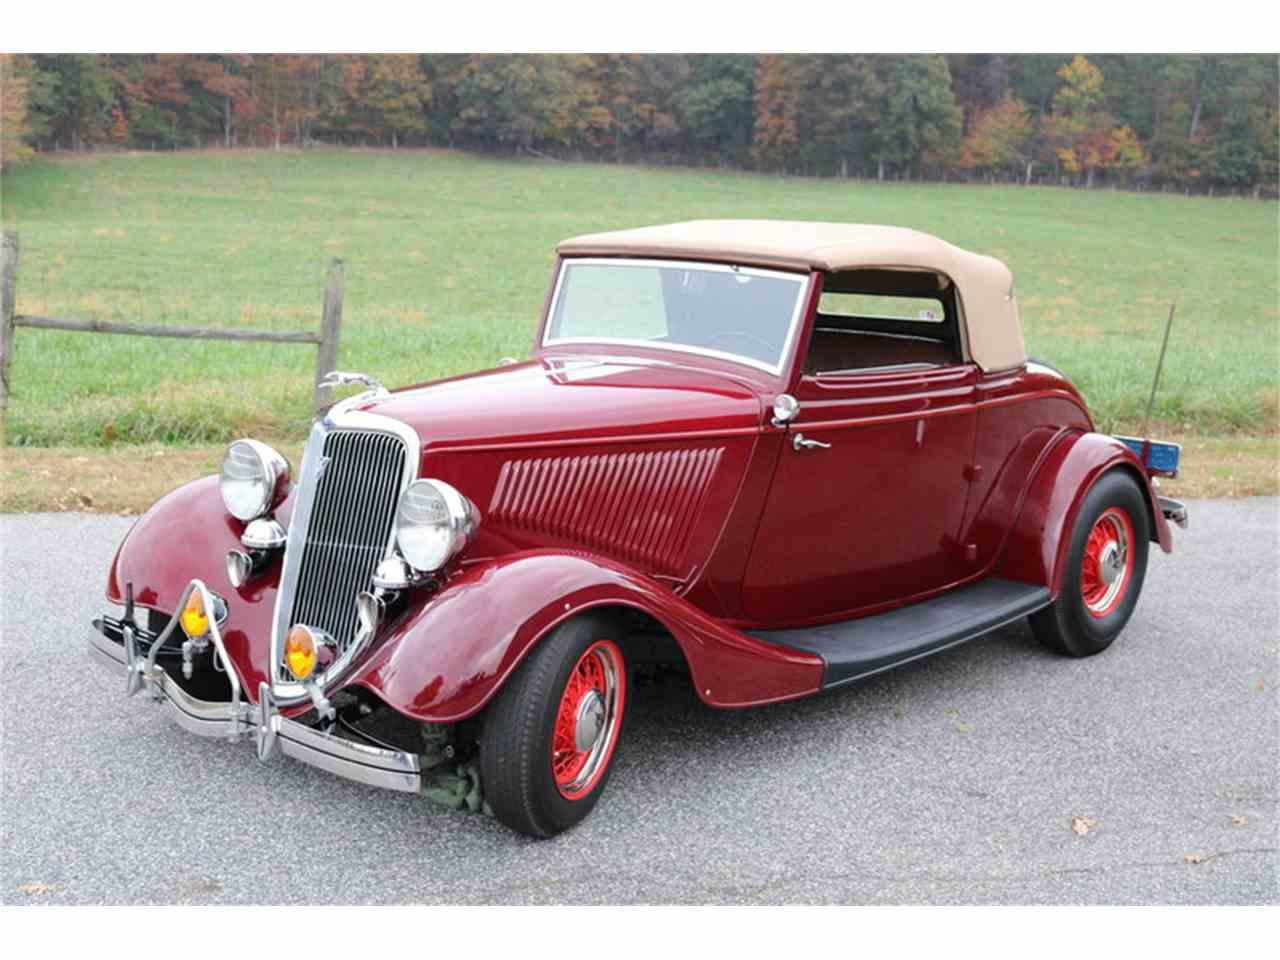 1934 Ford Cabriolet for Sale | ClassicCars.com | CC-1053438